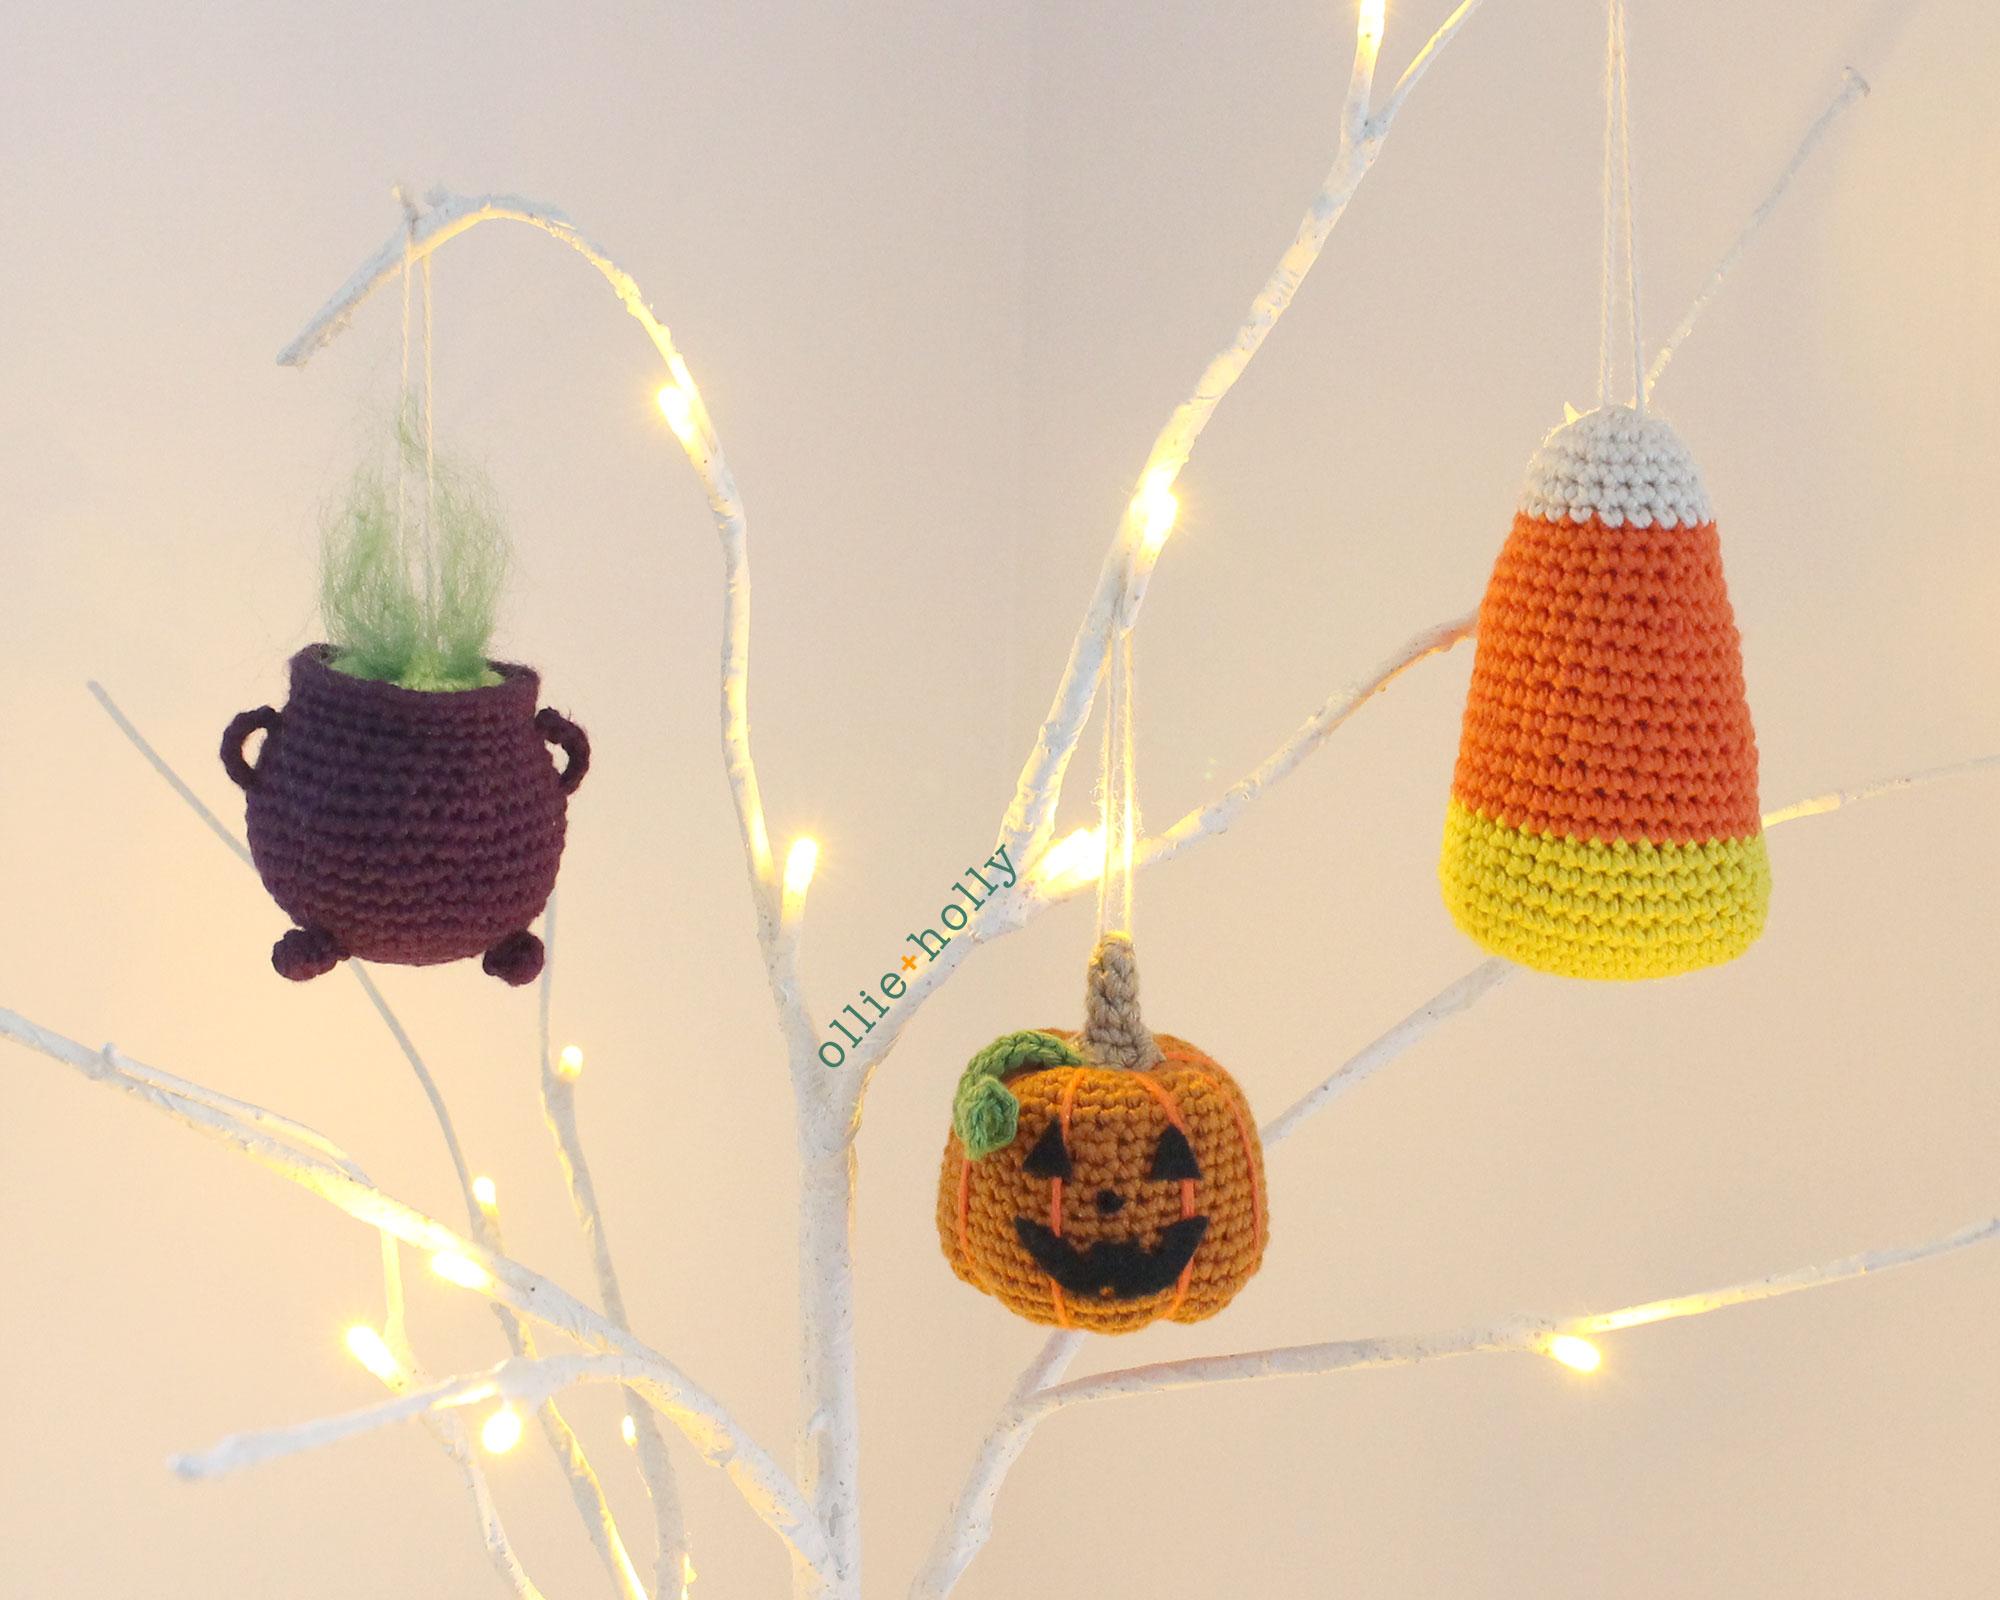 Free Halloween Tree DIY Ornaments Amigurumi Crochet Collection Trick or Treat Bundle